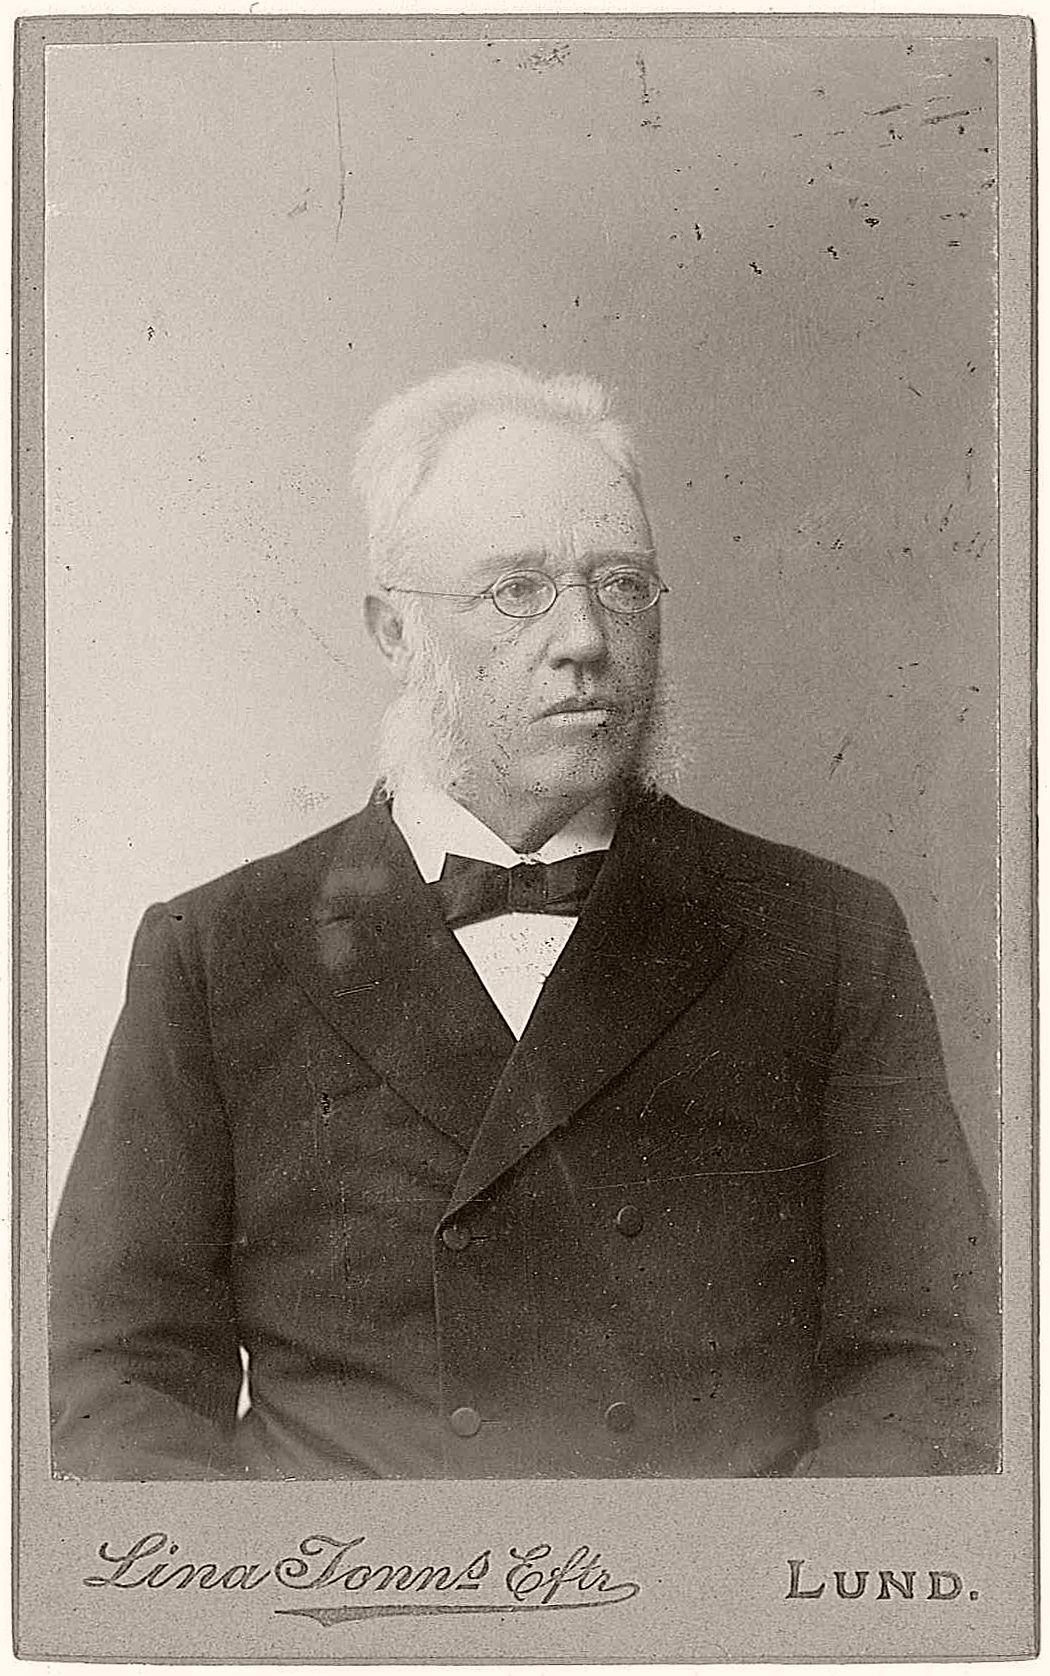 Fredrik Areschoug (1830-1908), Swedish professor of botany at Lund University.